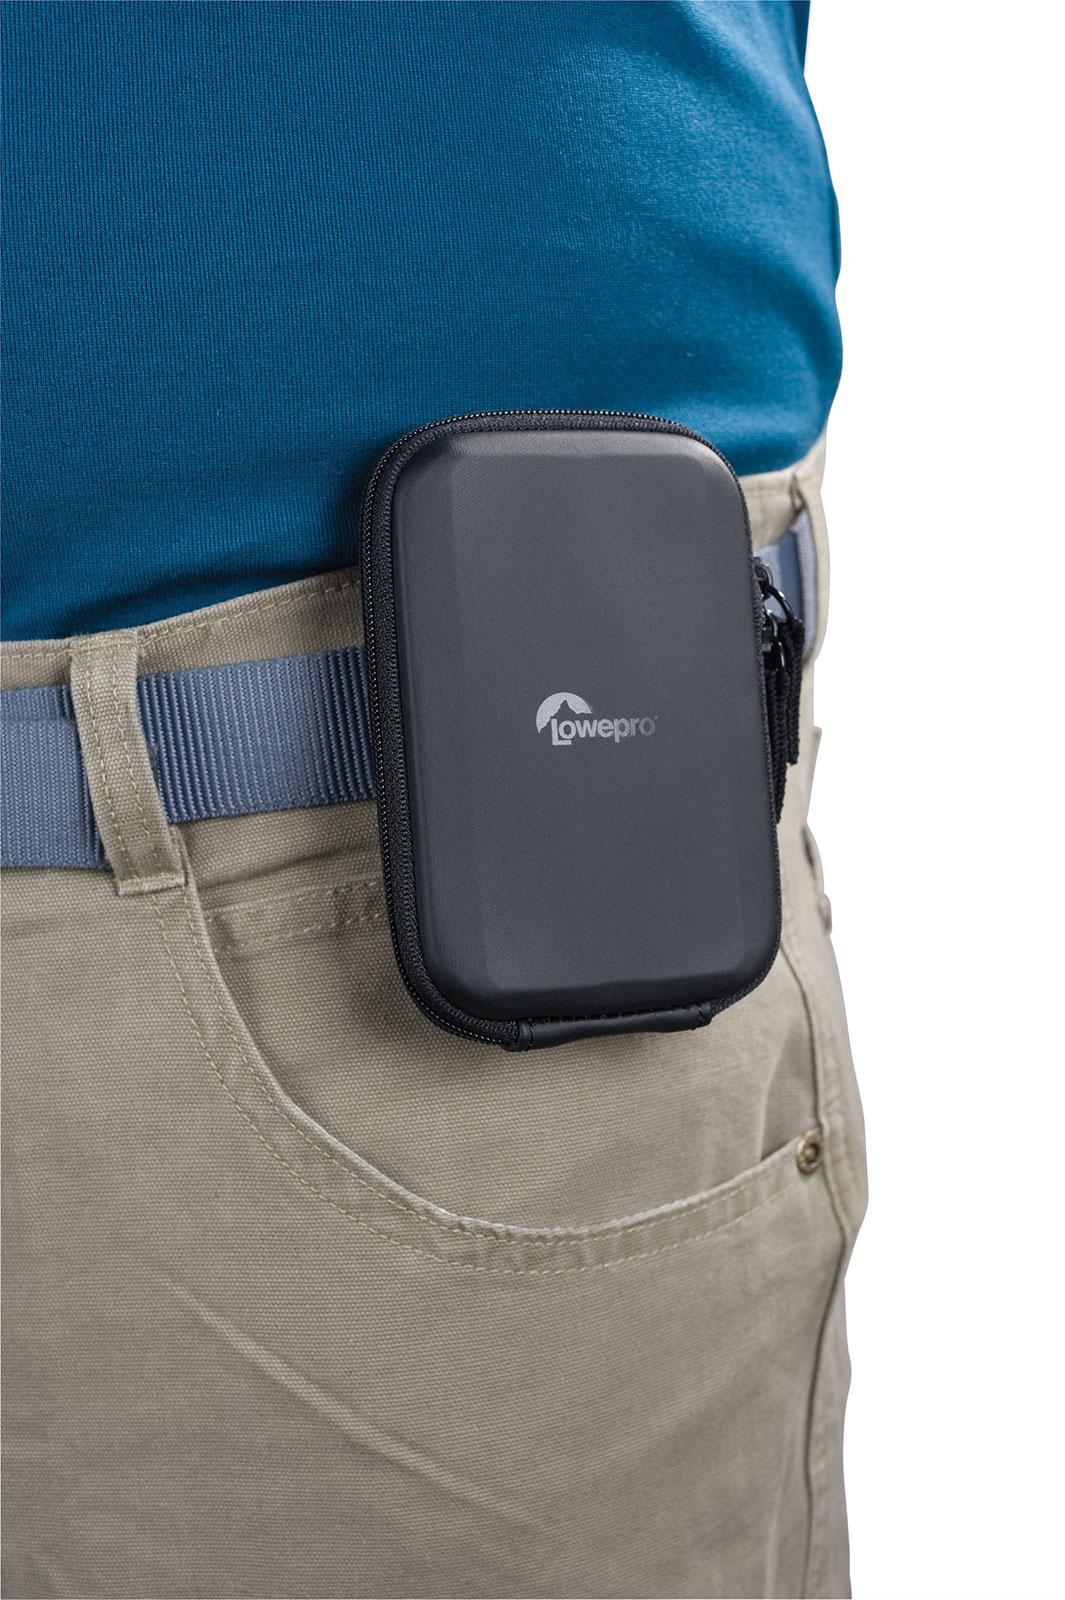 NEW Lowepro Volta 30 Hard Drive Digital Camera iPod Iphone GPS Case Pouch Black